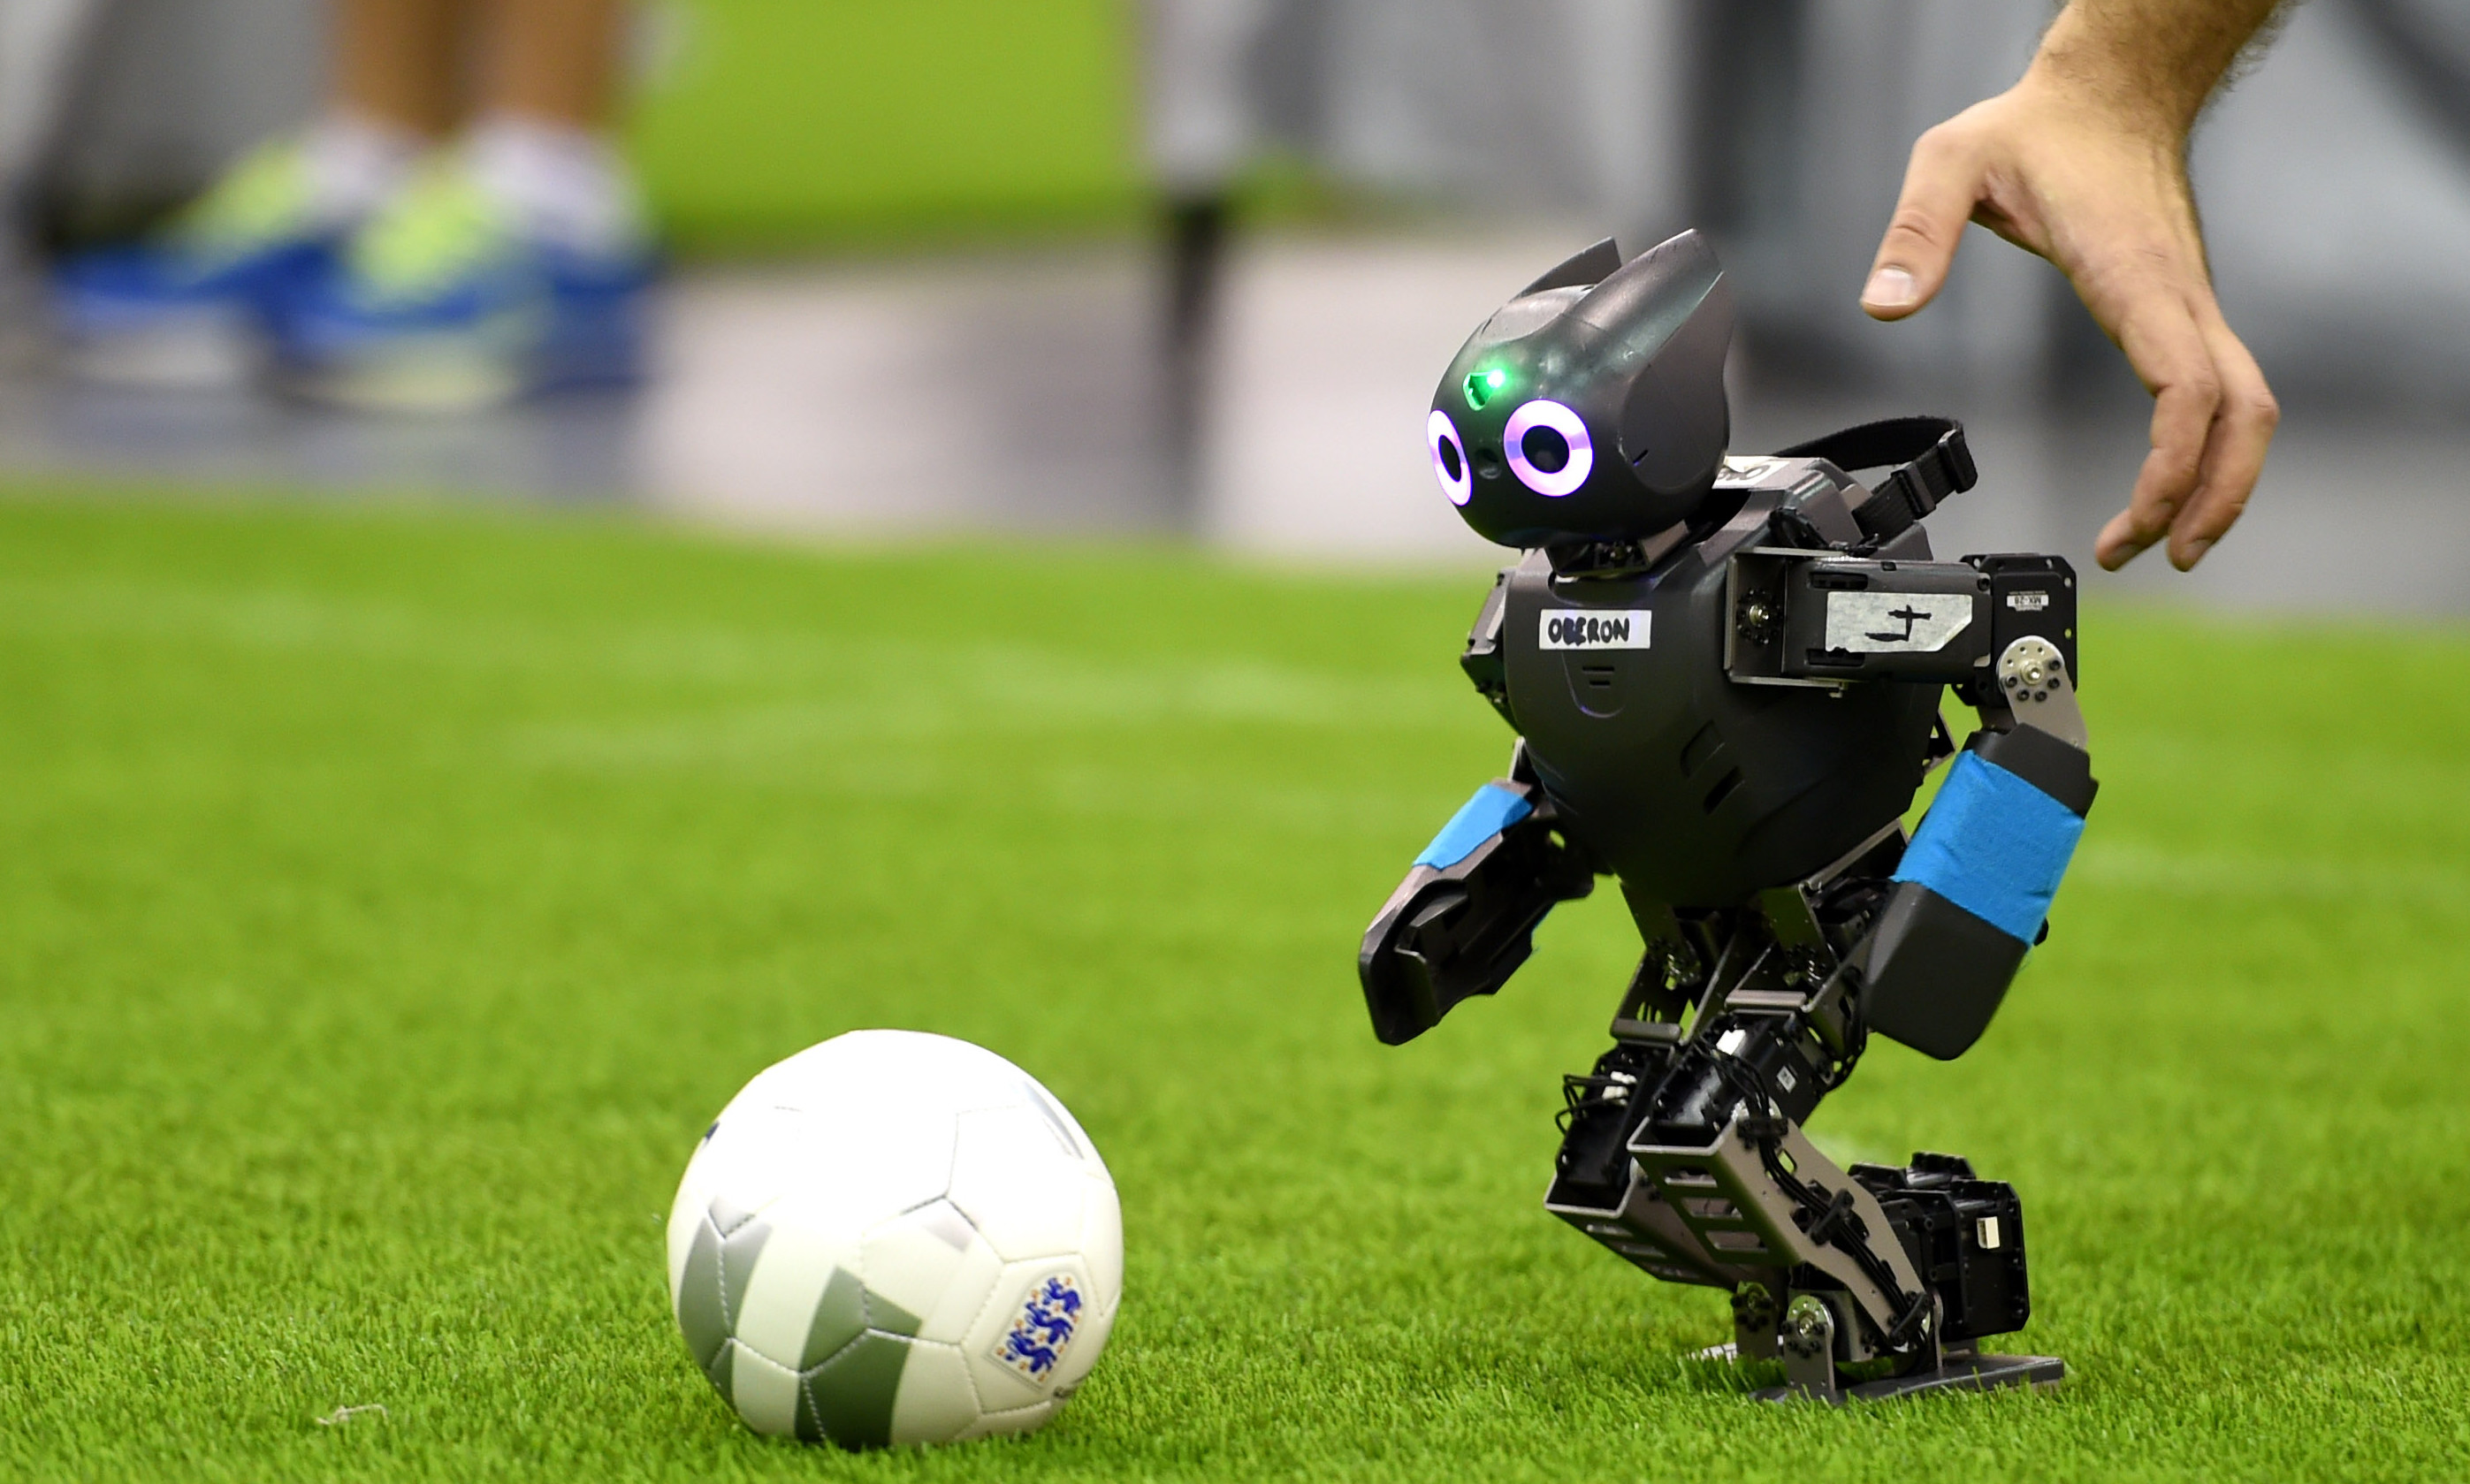 robot chameleon sf Pinterest Image search Robots and · ChameleonsSoccer Ball Robots